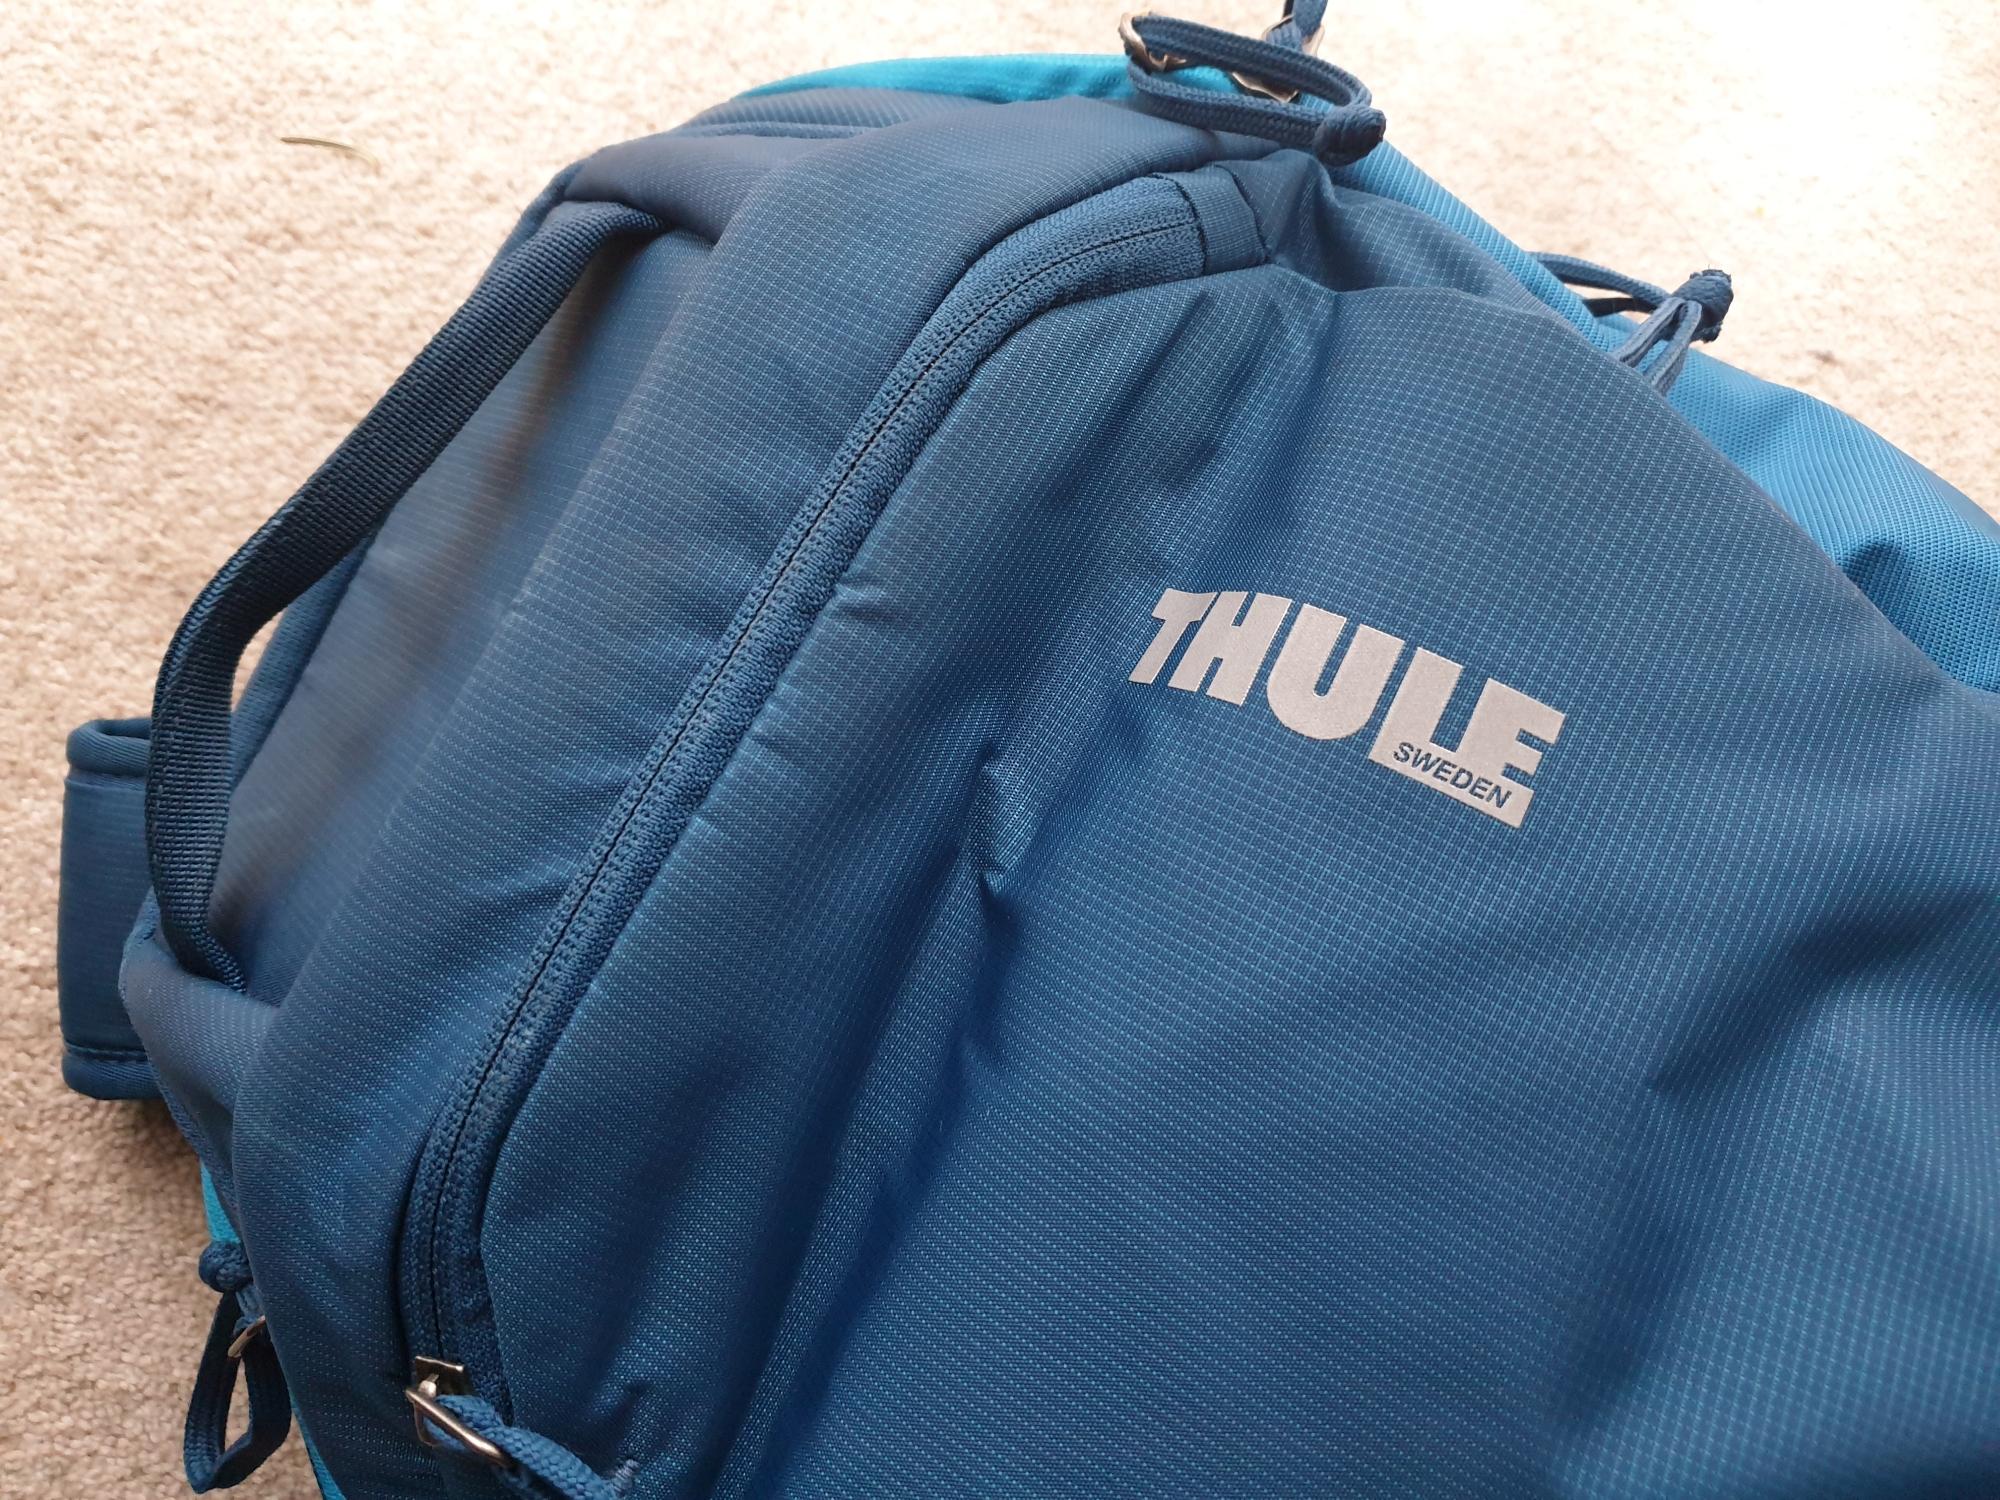 Thule EnRoute 23L - miejski plecak, który teraz kupisz o 57% taniej (opinia) 28